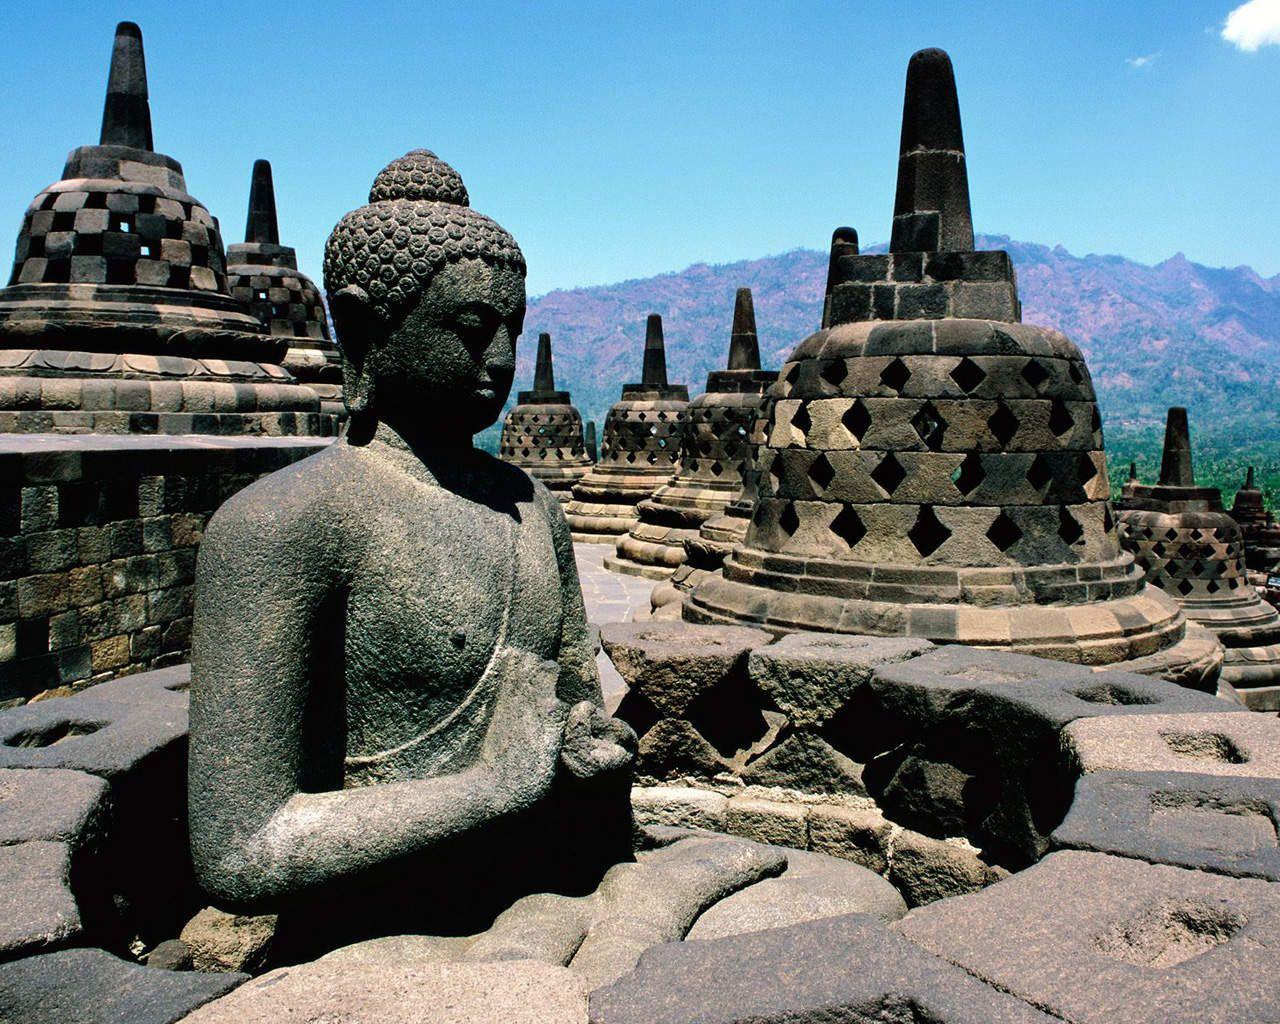 Borobudur Indonesia 7 Wonders Of The World Borobudur Temple Borobudur Wonders Of The World